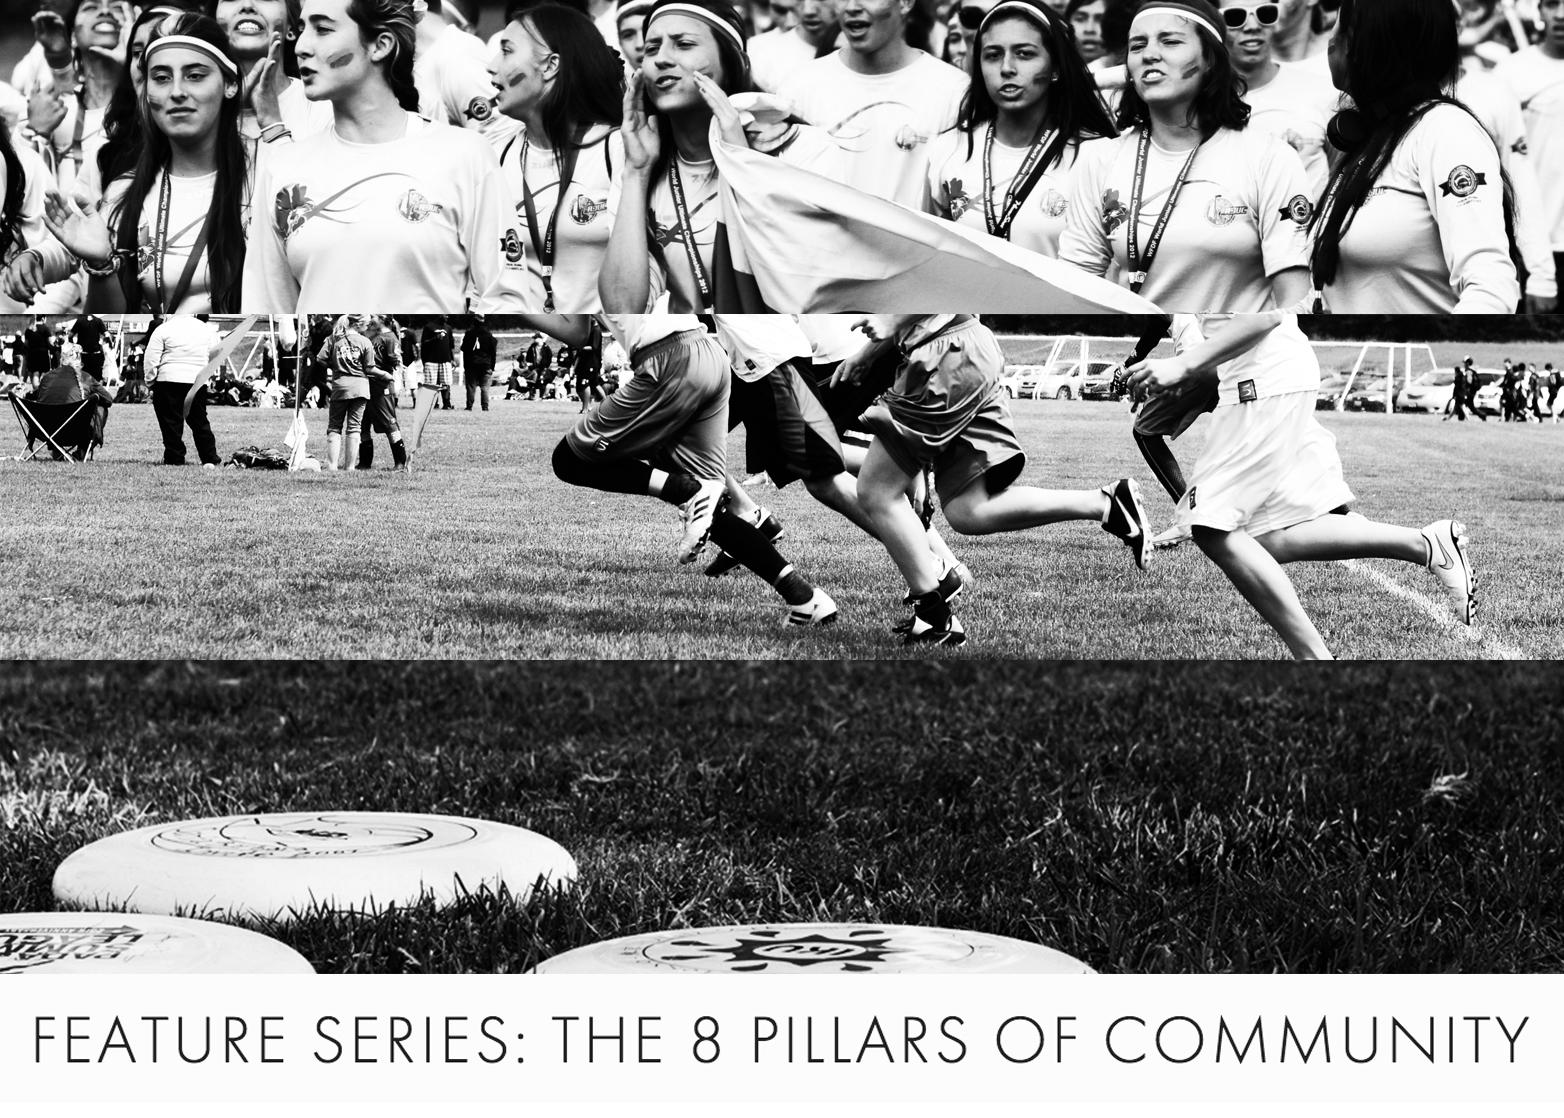 8-pillars-of-community.jpg